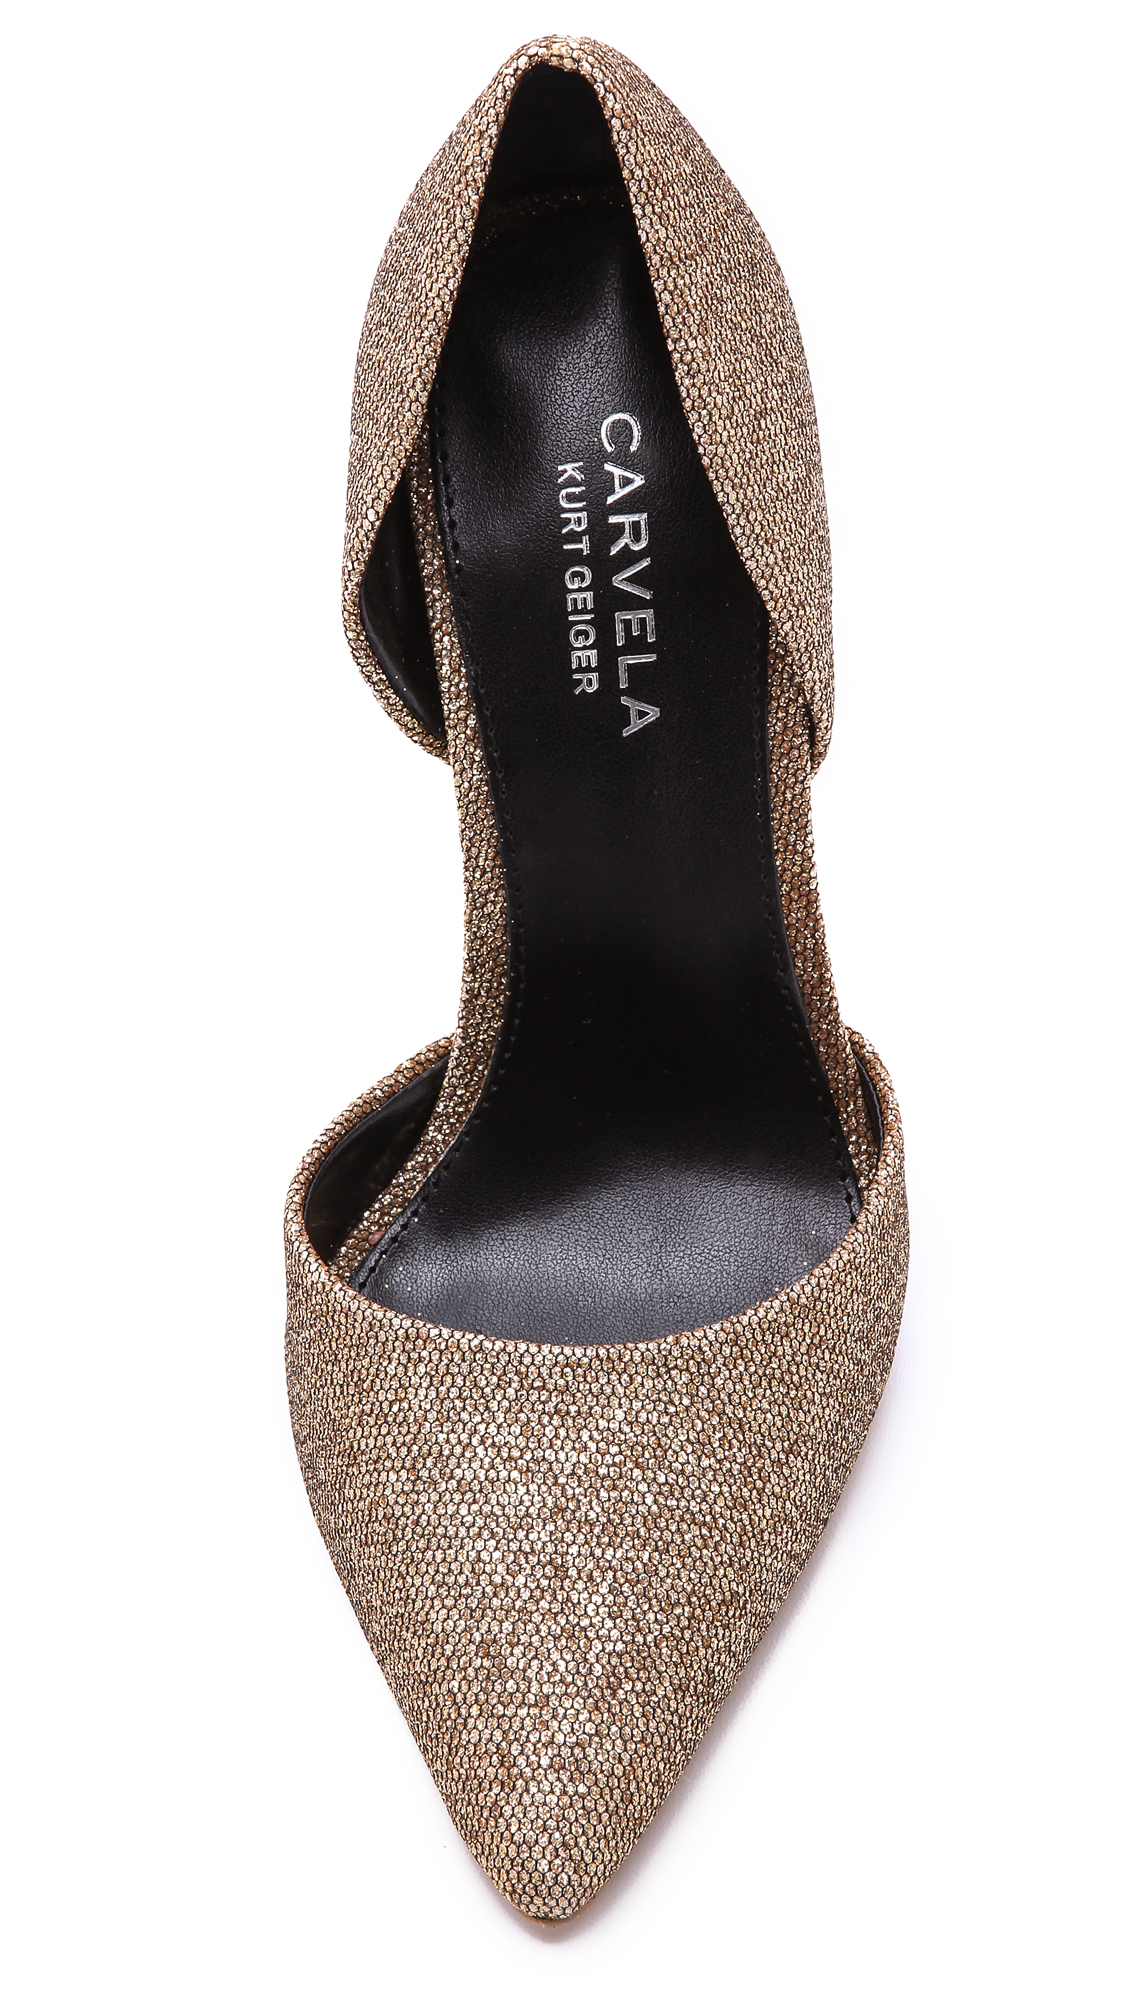 Kurt Geiger Shoe Sizes